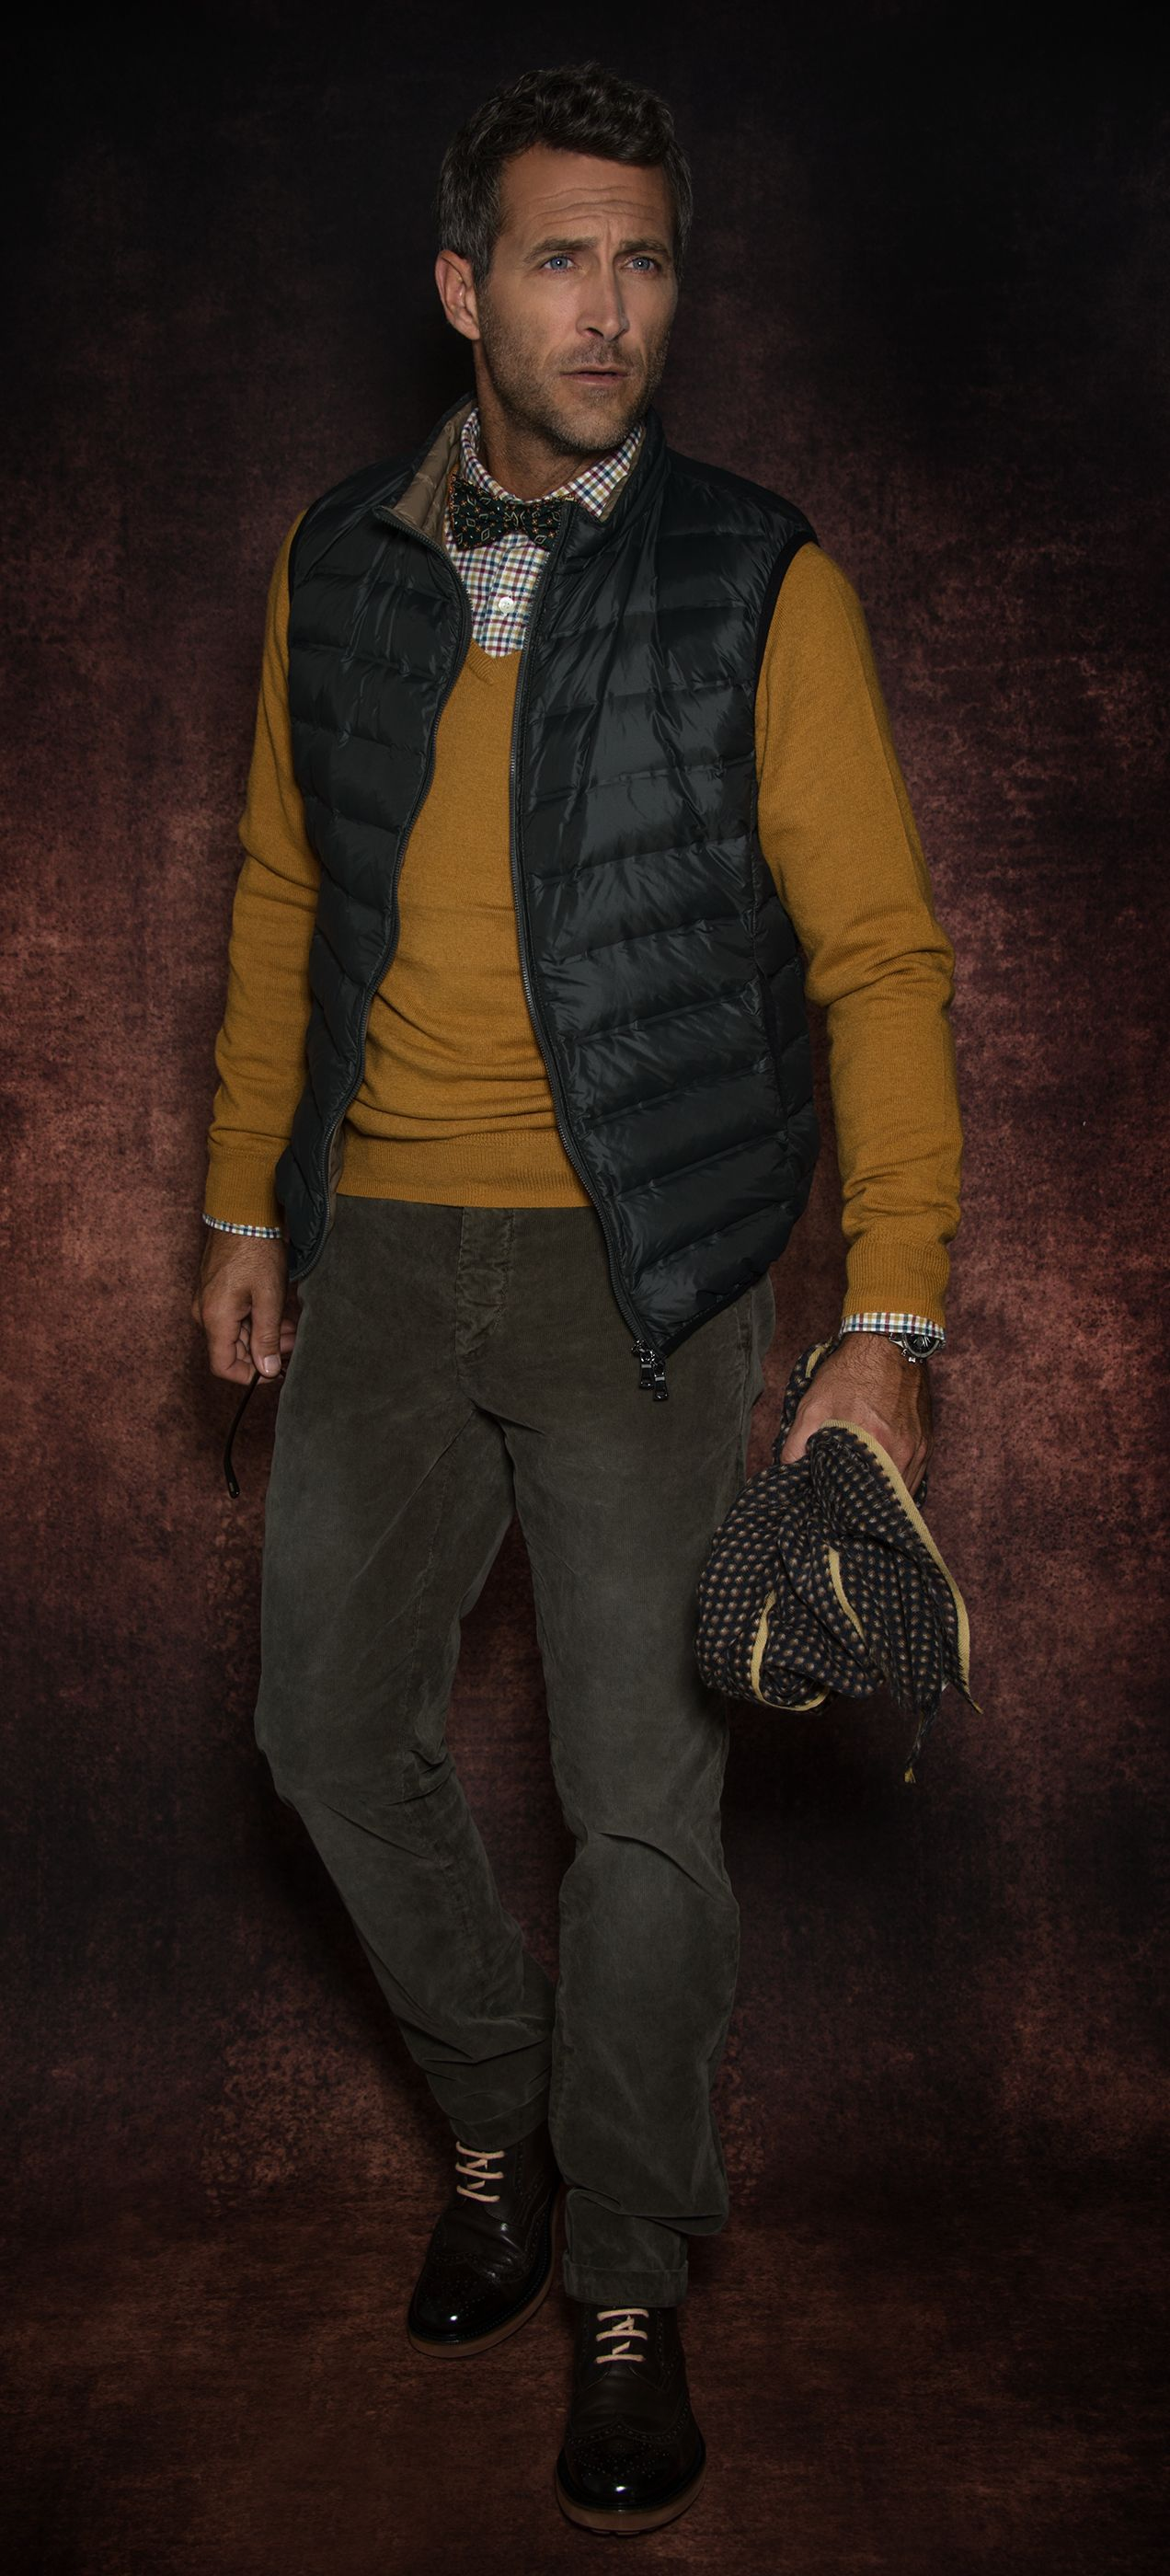 Furest Colección AW14 #tomerickson by #alejandromolina #furestinvierno14 #furest